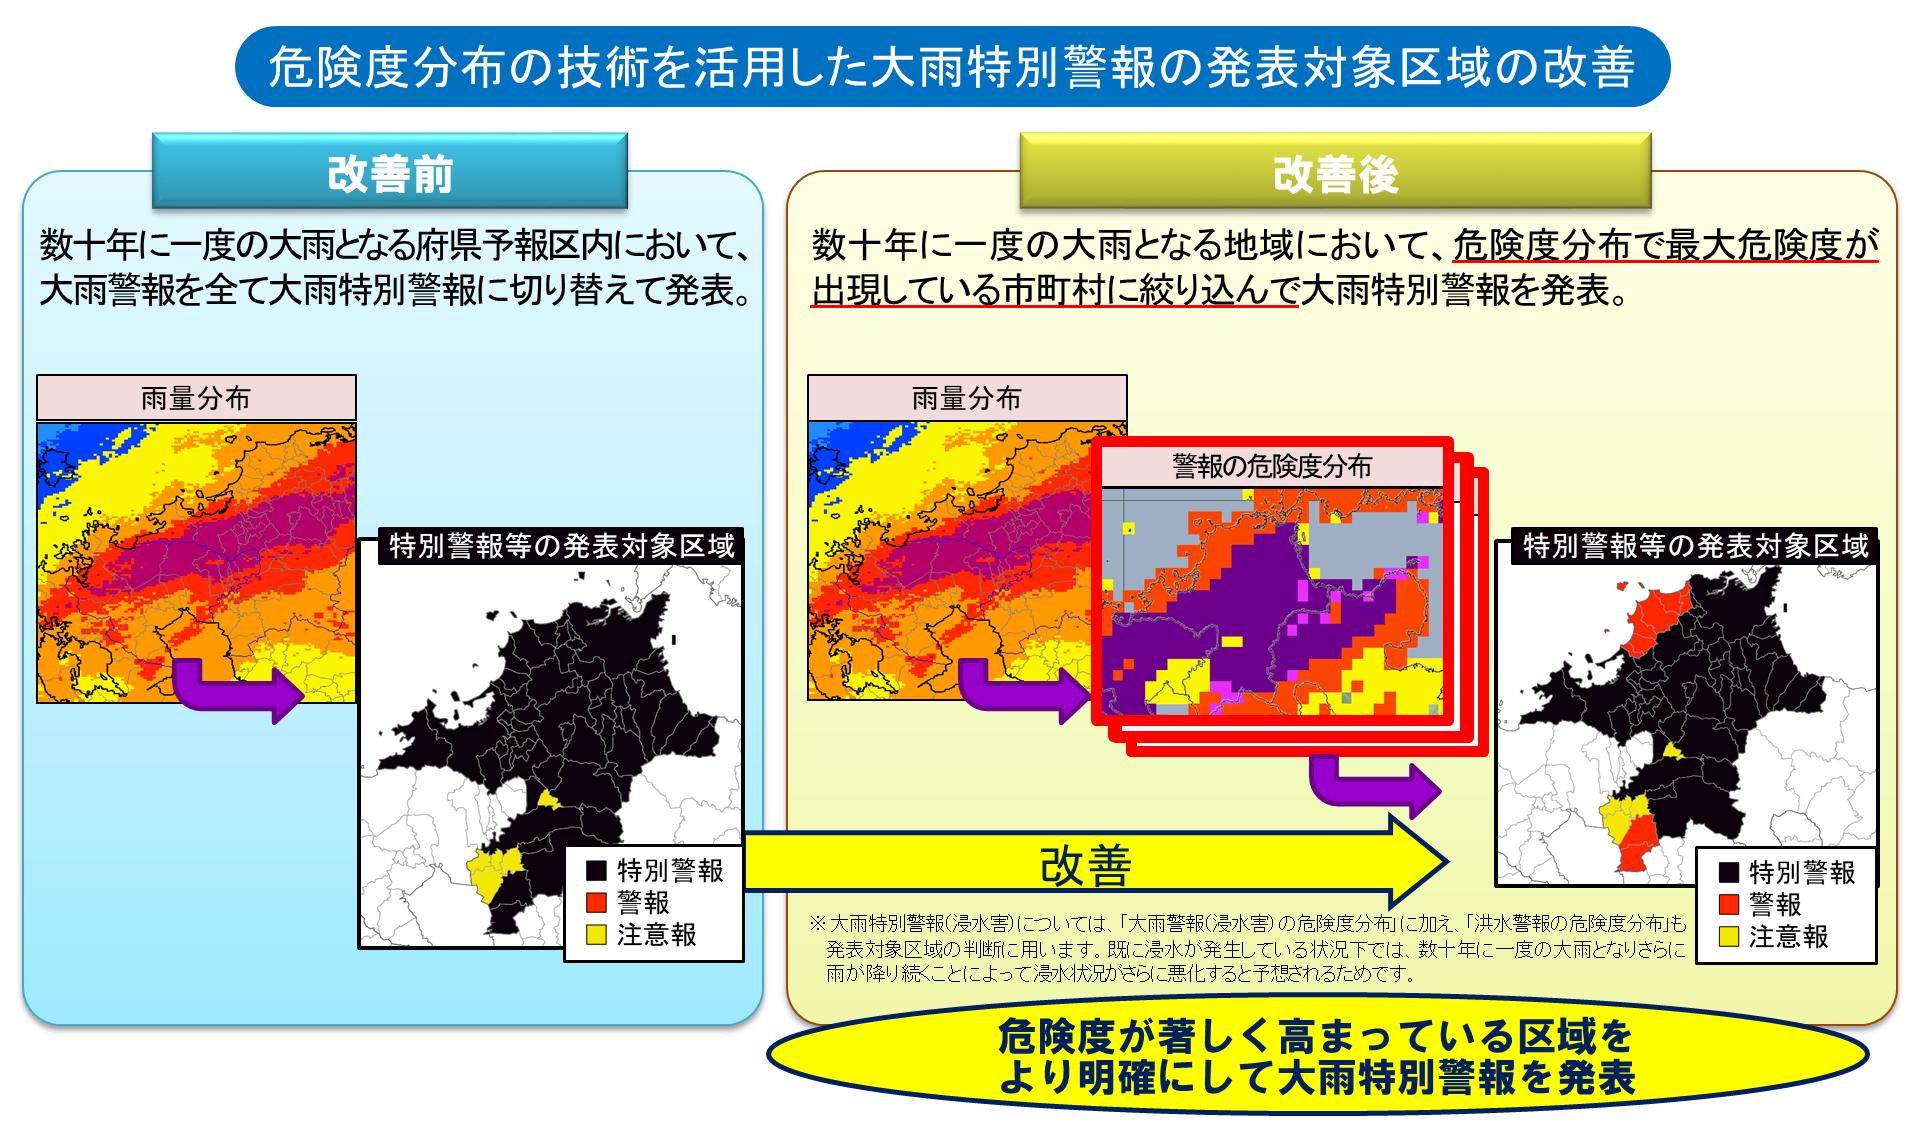 気象庁|危険度分布の技術を活用...